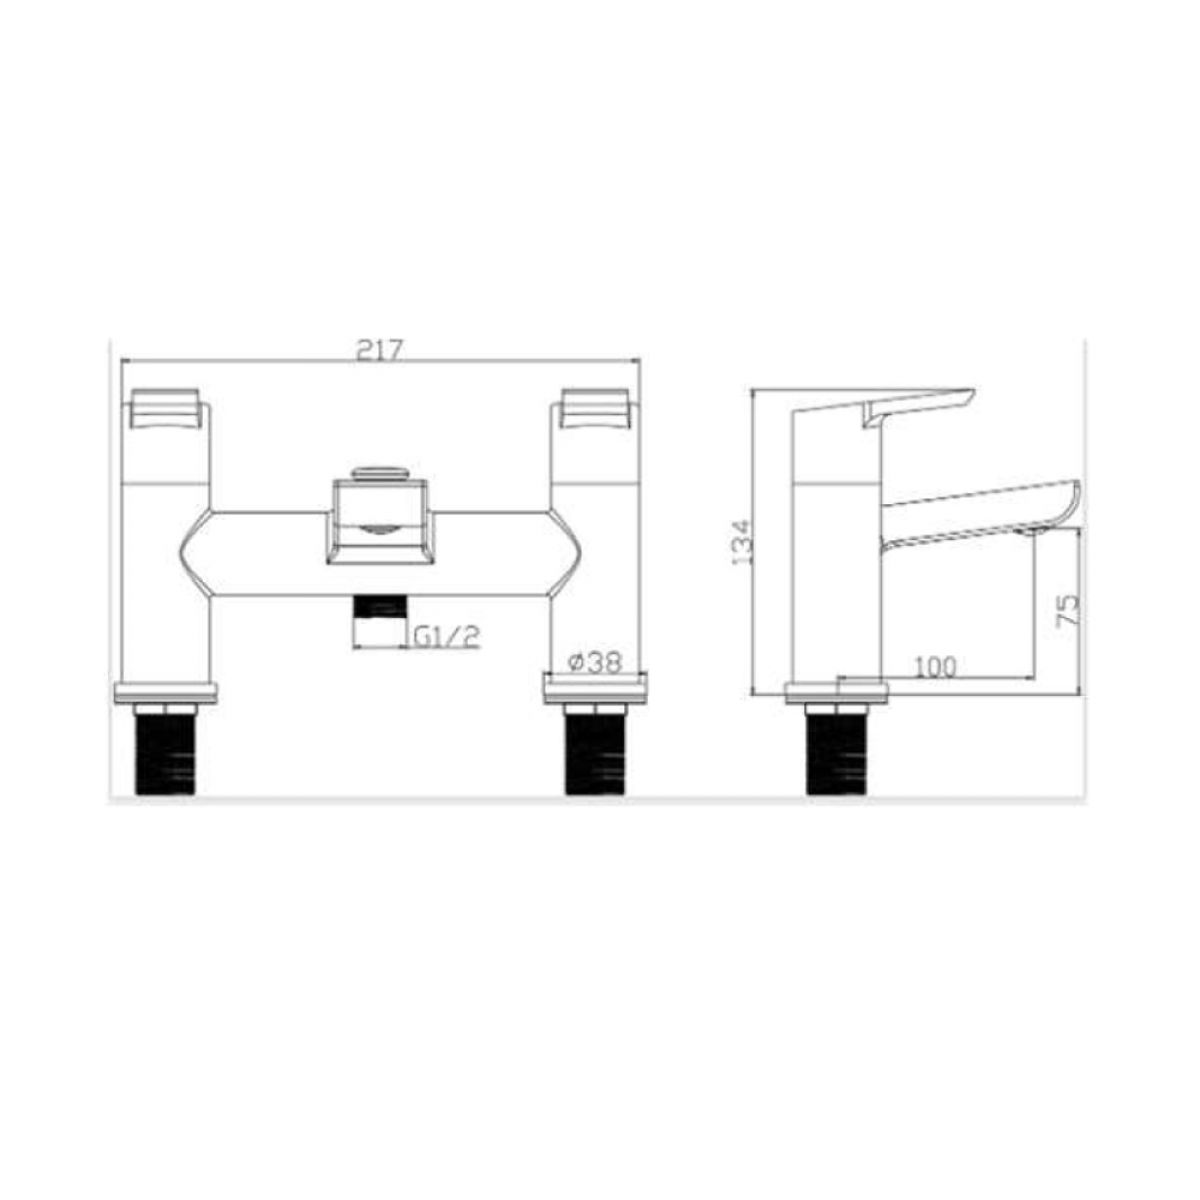 RAK Sport Deck Mounted Shower Bath Mixer Tap Measurements